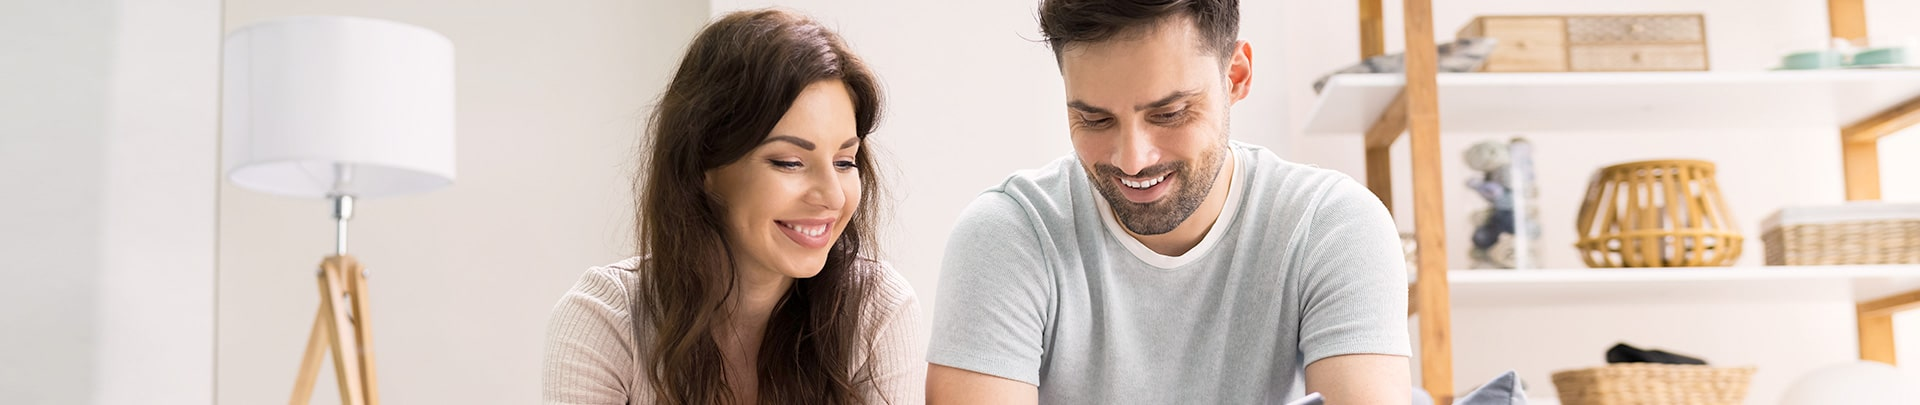 Paar sucht Immobilien